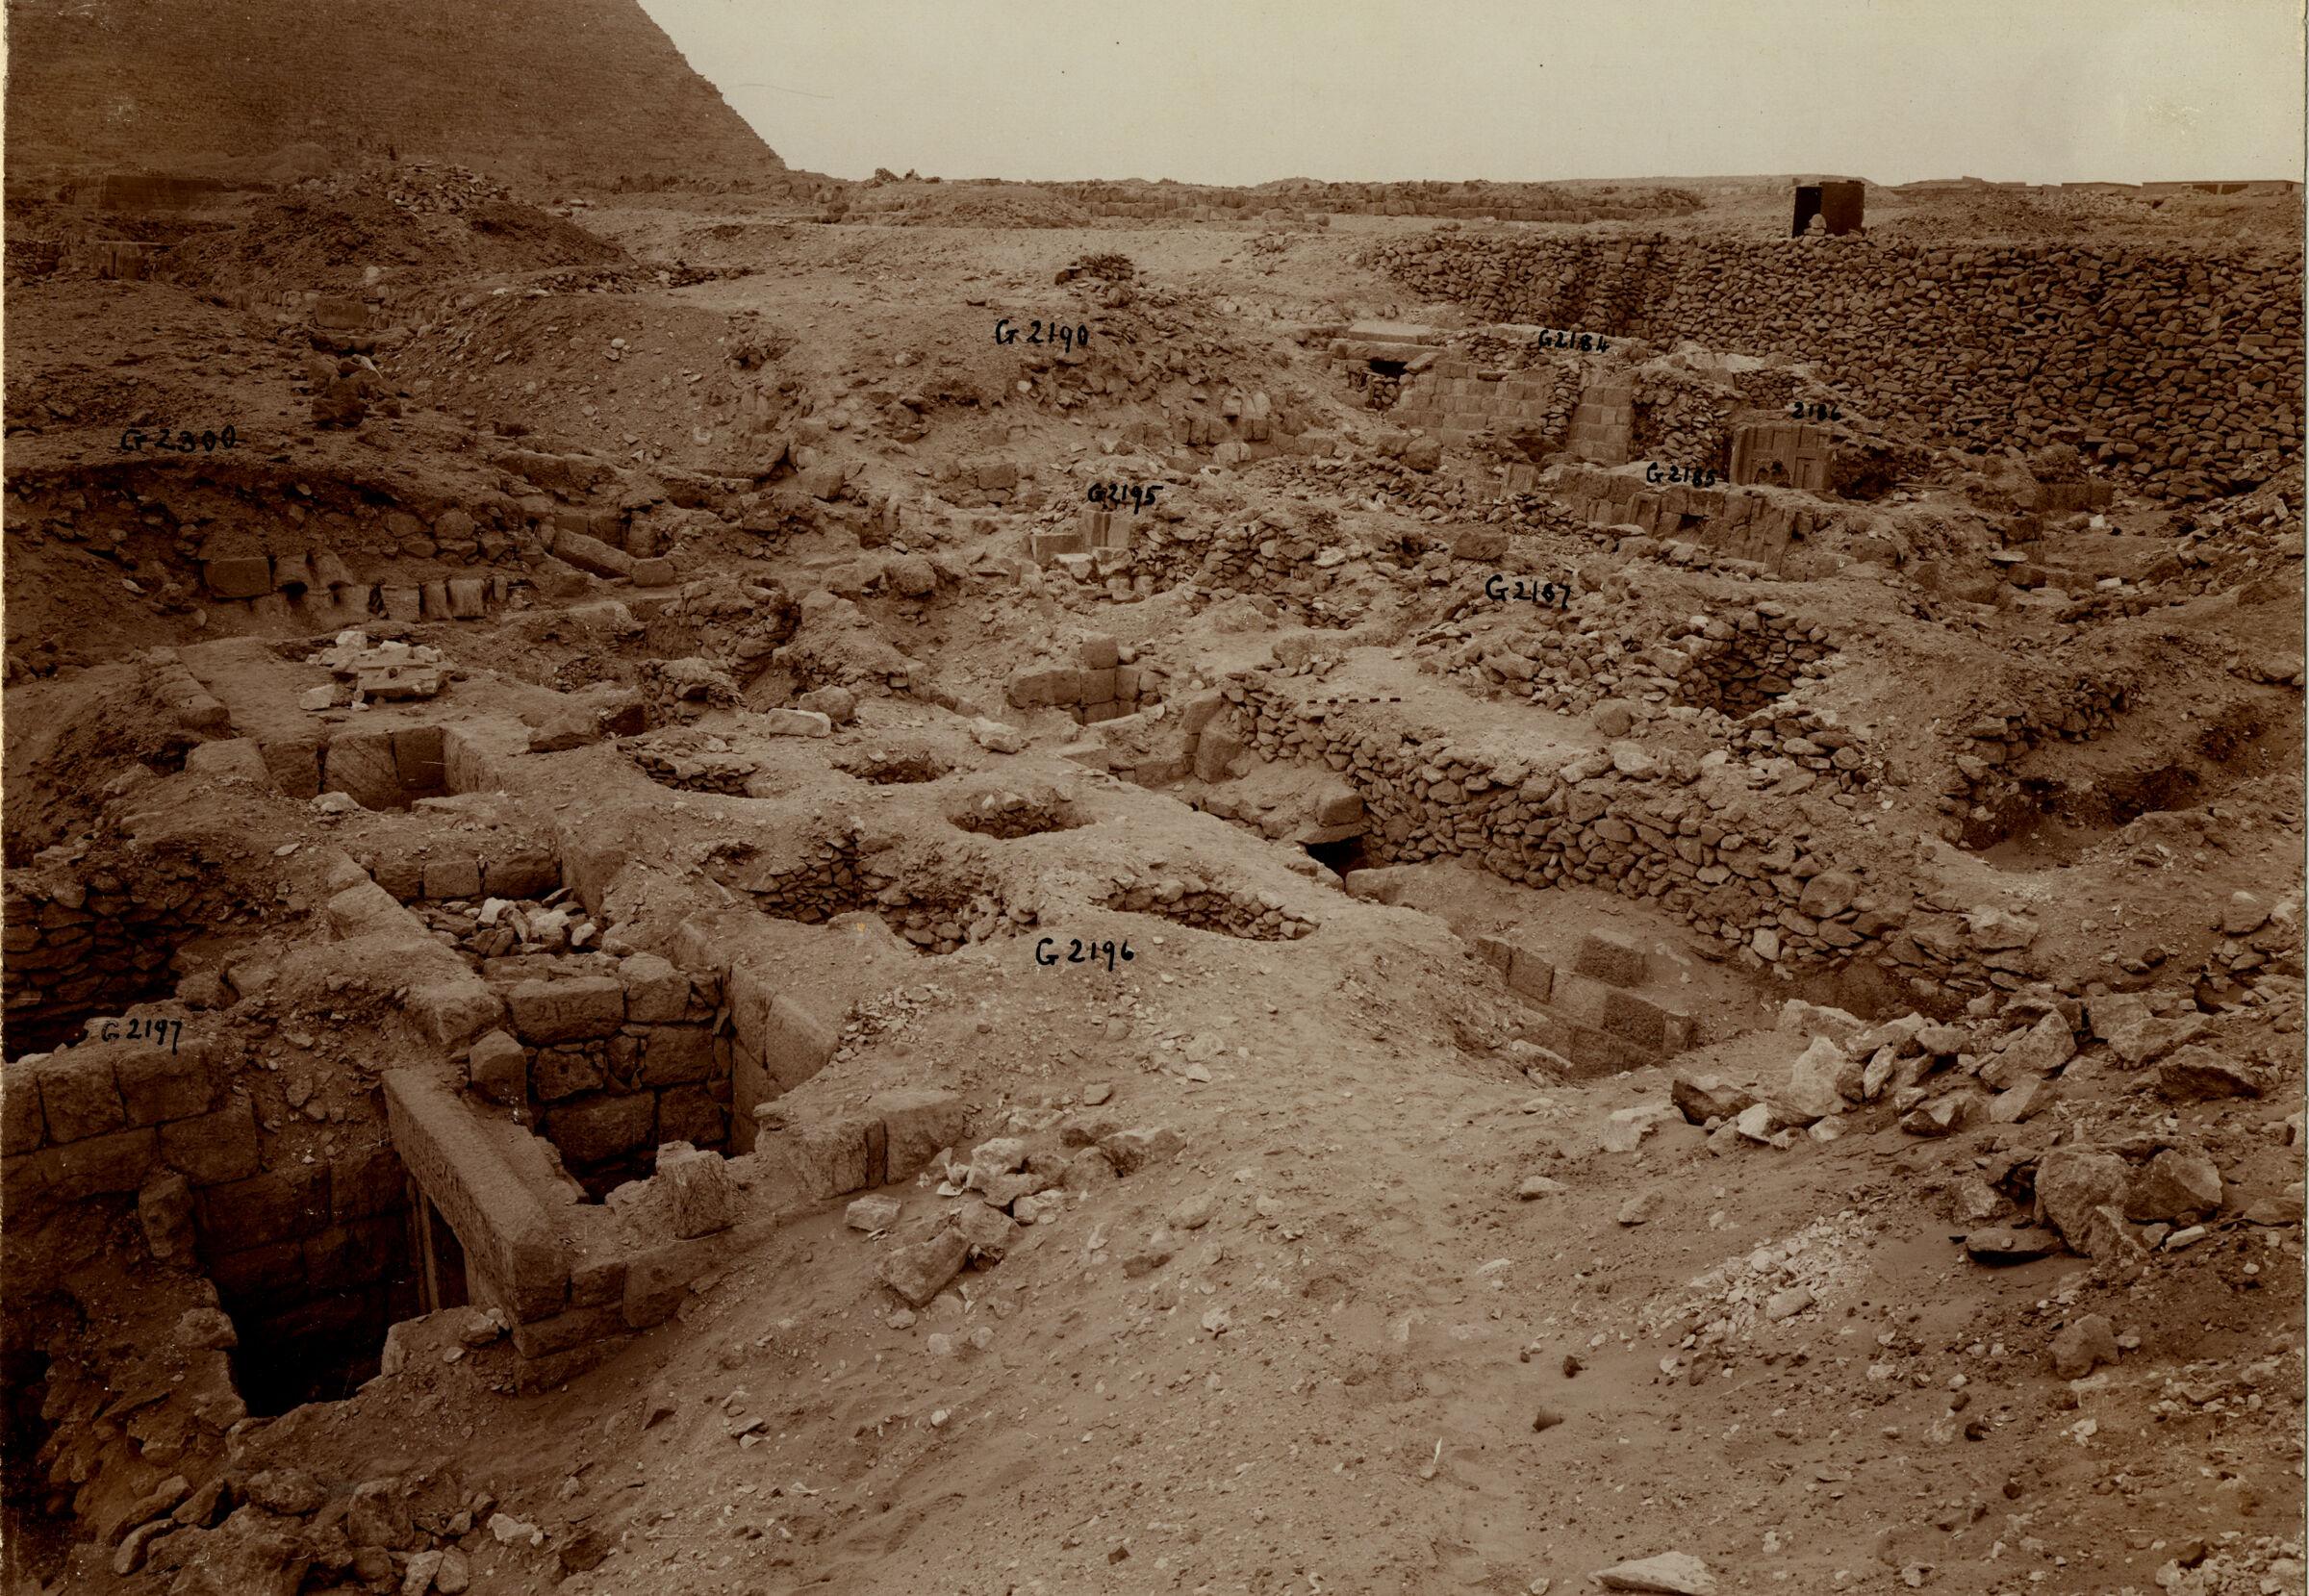 Western Cemetery: Site: Giza; View: G 2197, G 2196, G 2195, G 2187, G 2188, G 2186, G 2184